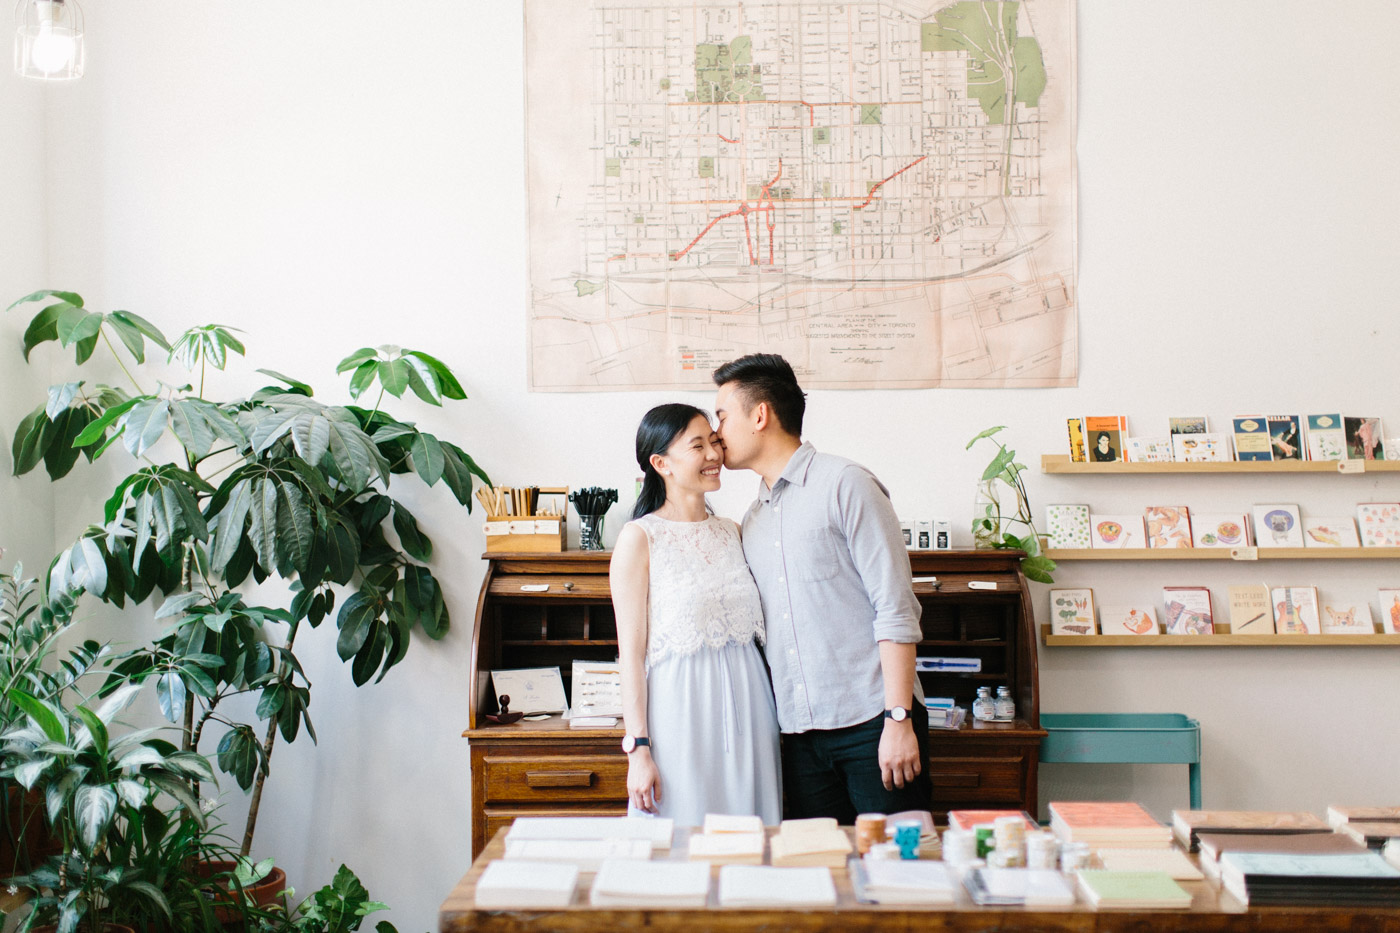 Toronto-Collingwood-Muskoka-Wedding-photographer-planning-your-engagement-session9.jpg